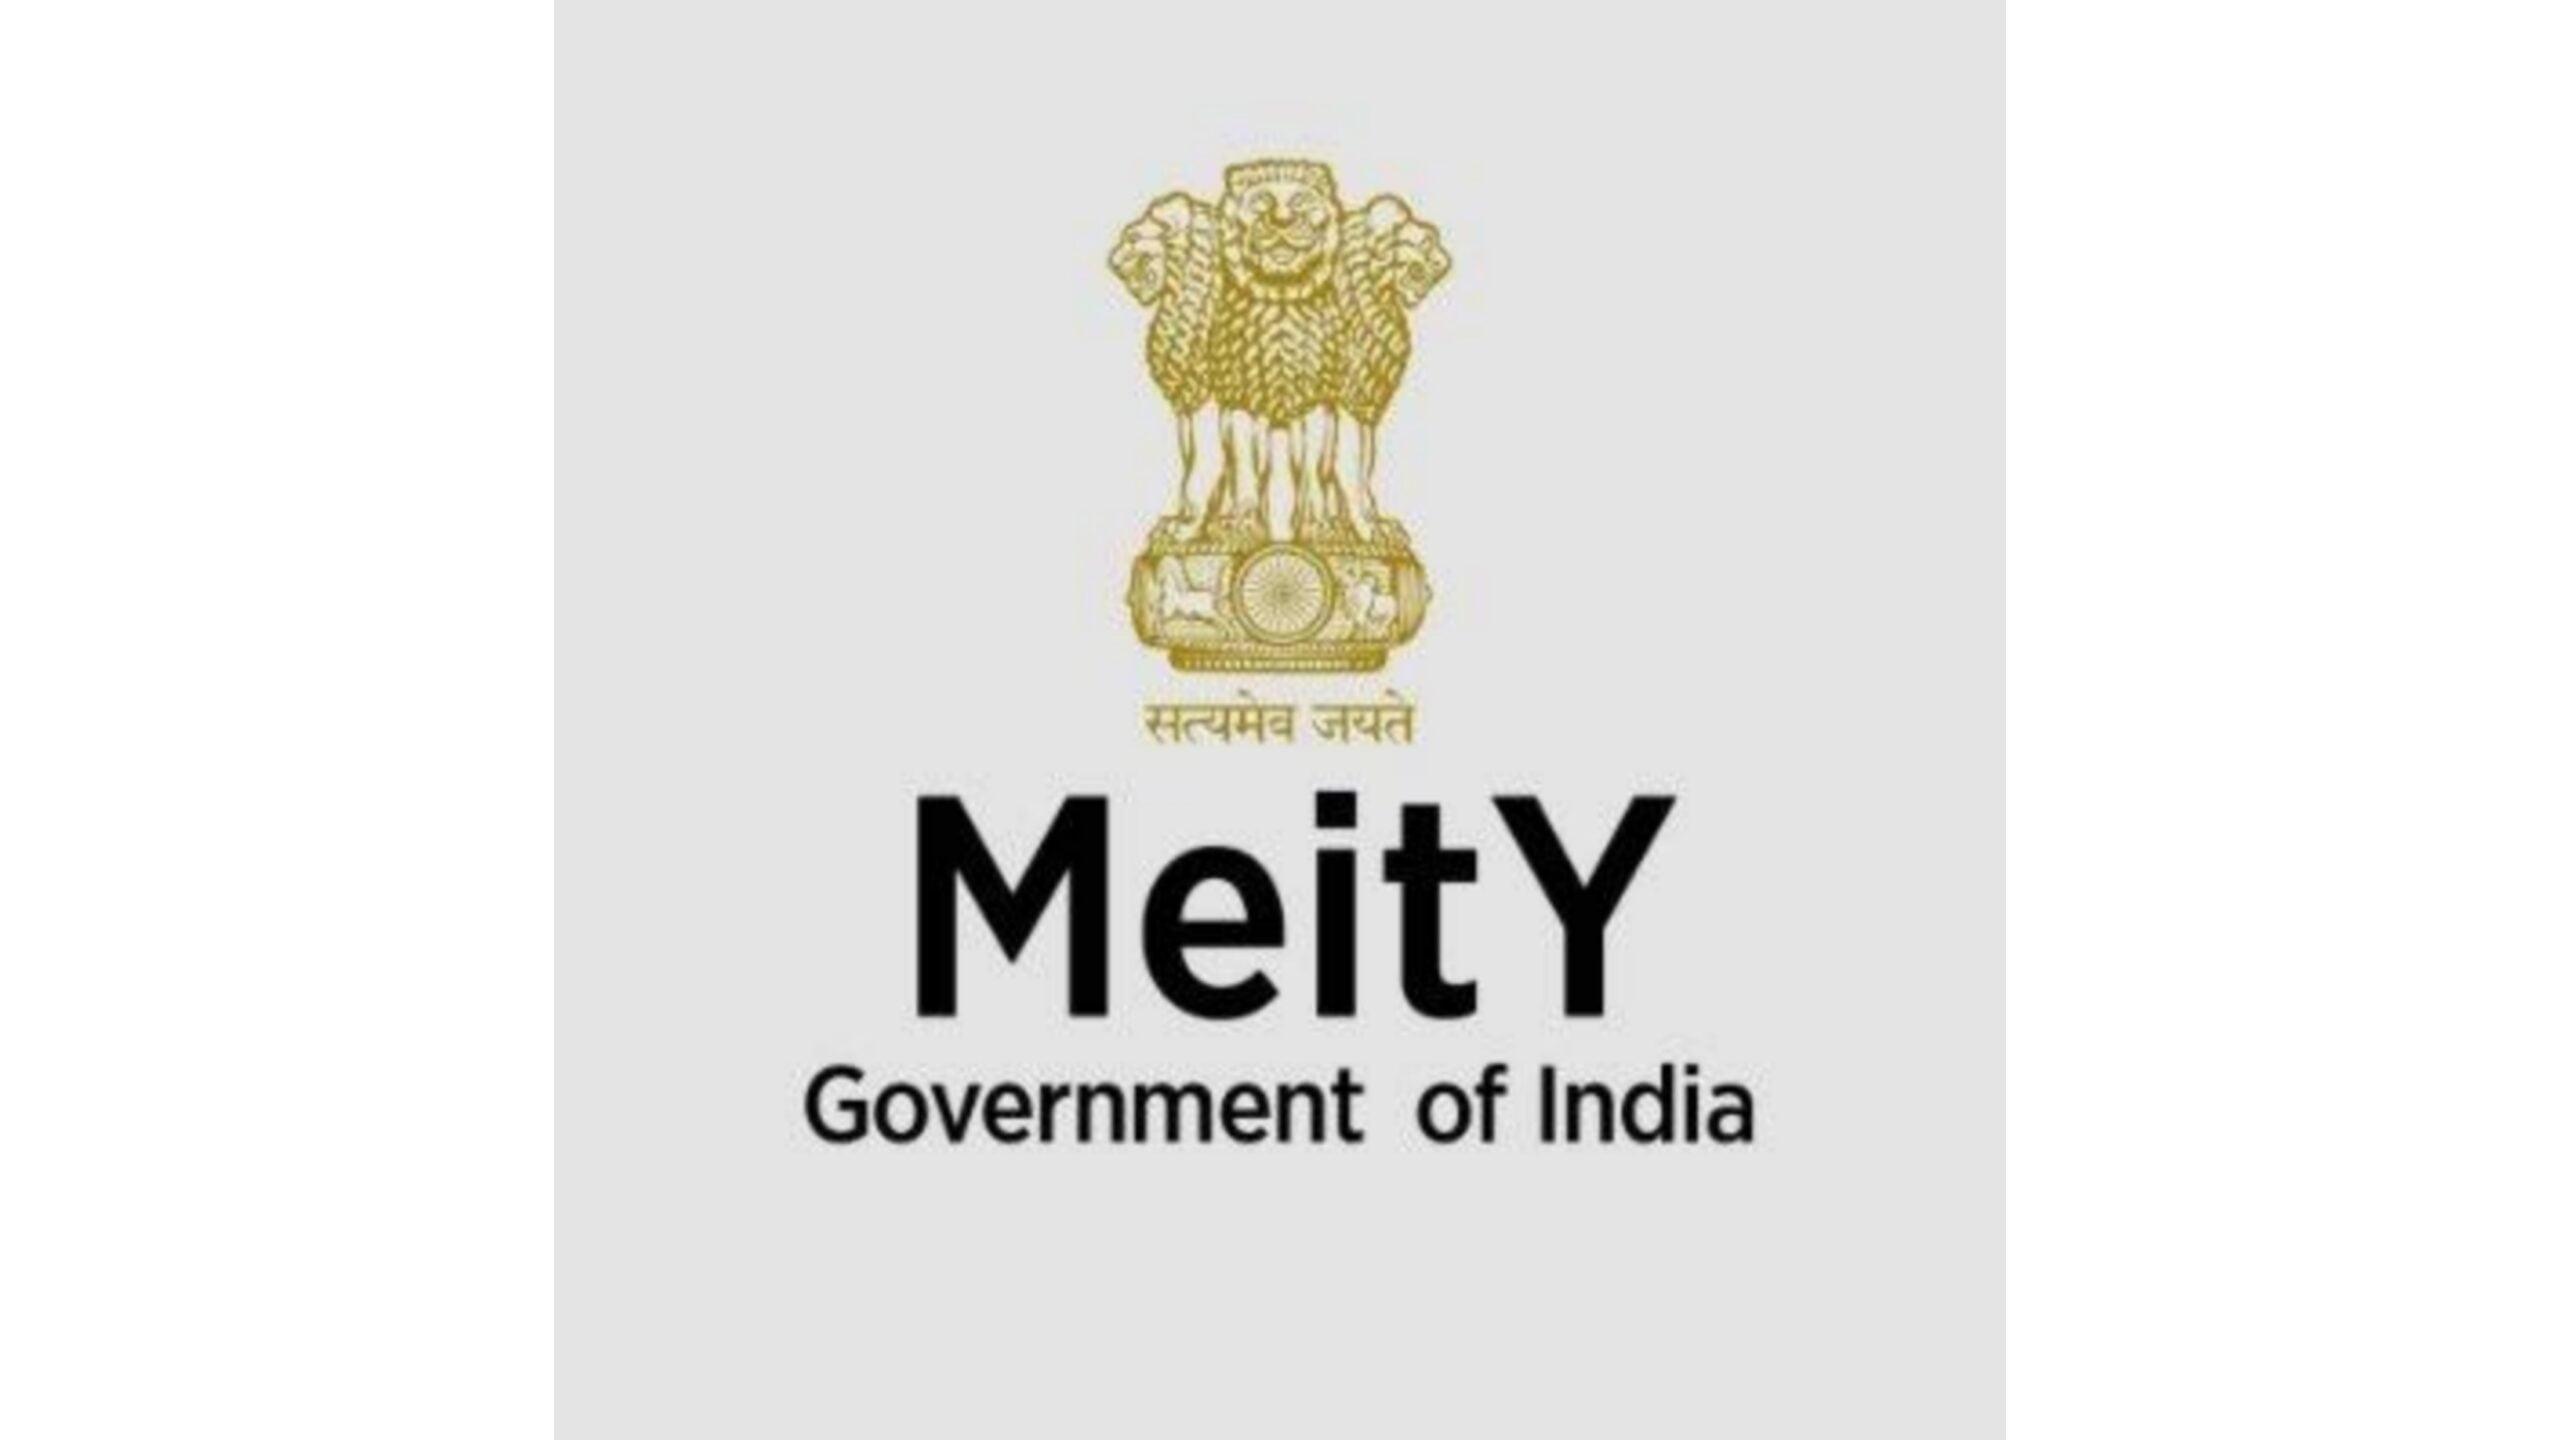 Meity Logo scaled